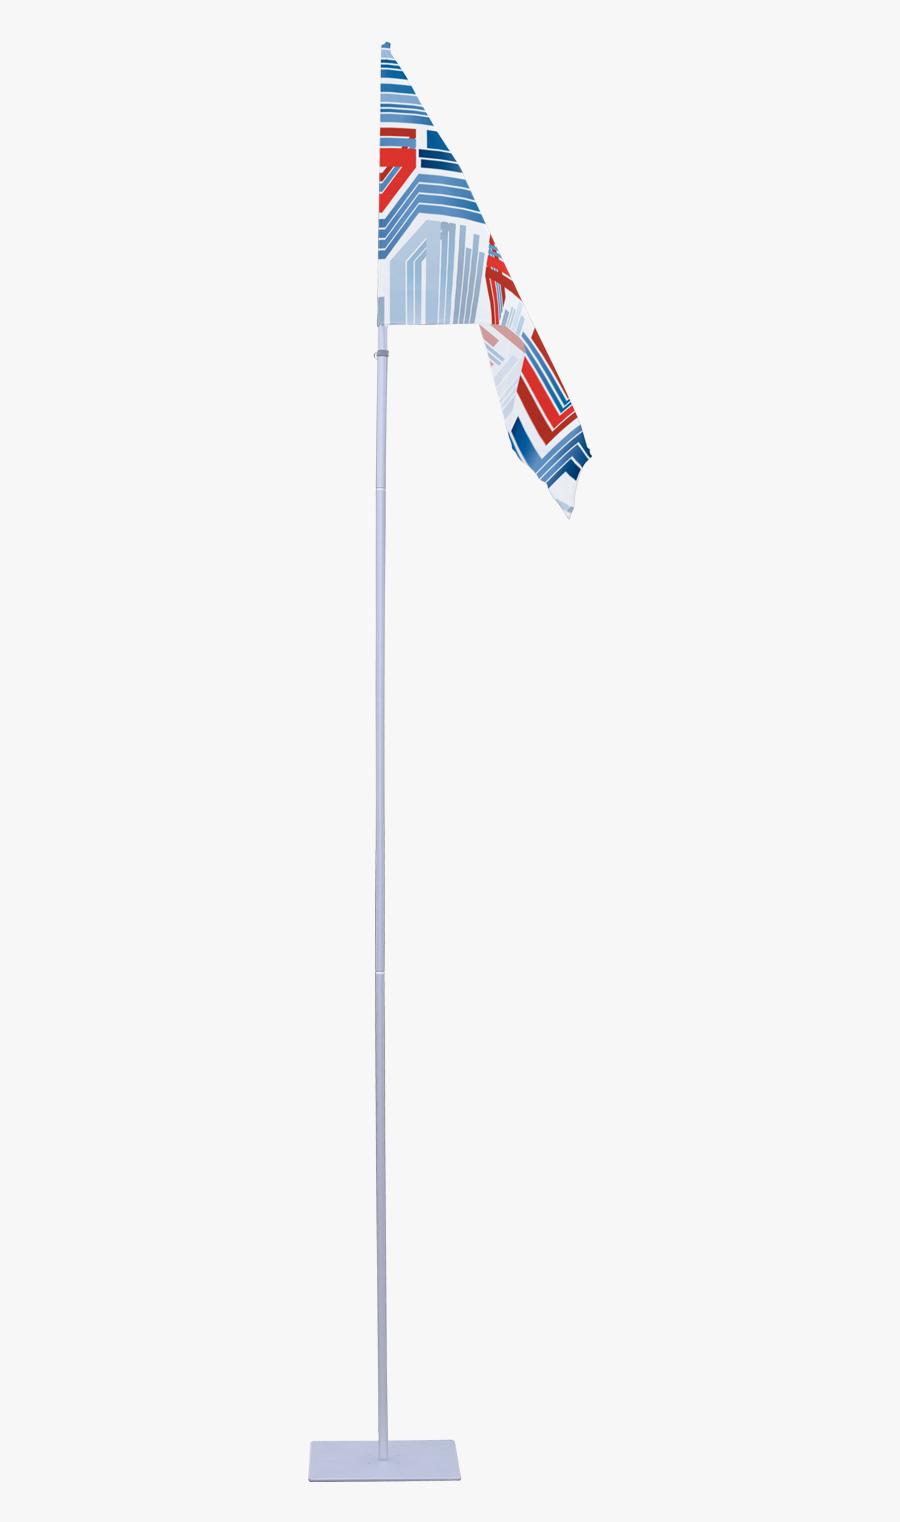 Golf Clipart Flag Pole - Flag, Transparent Clipart